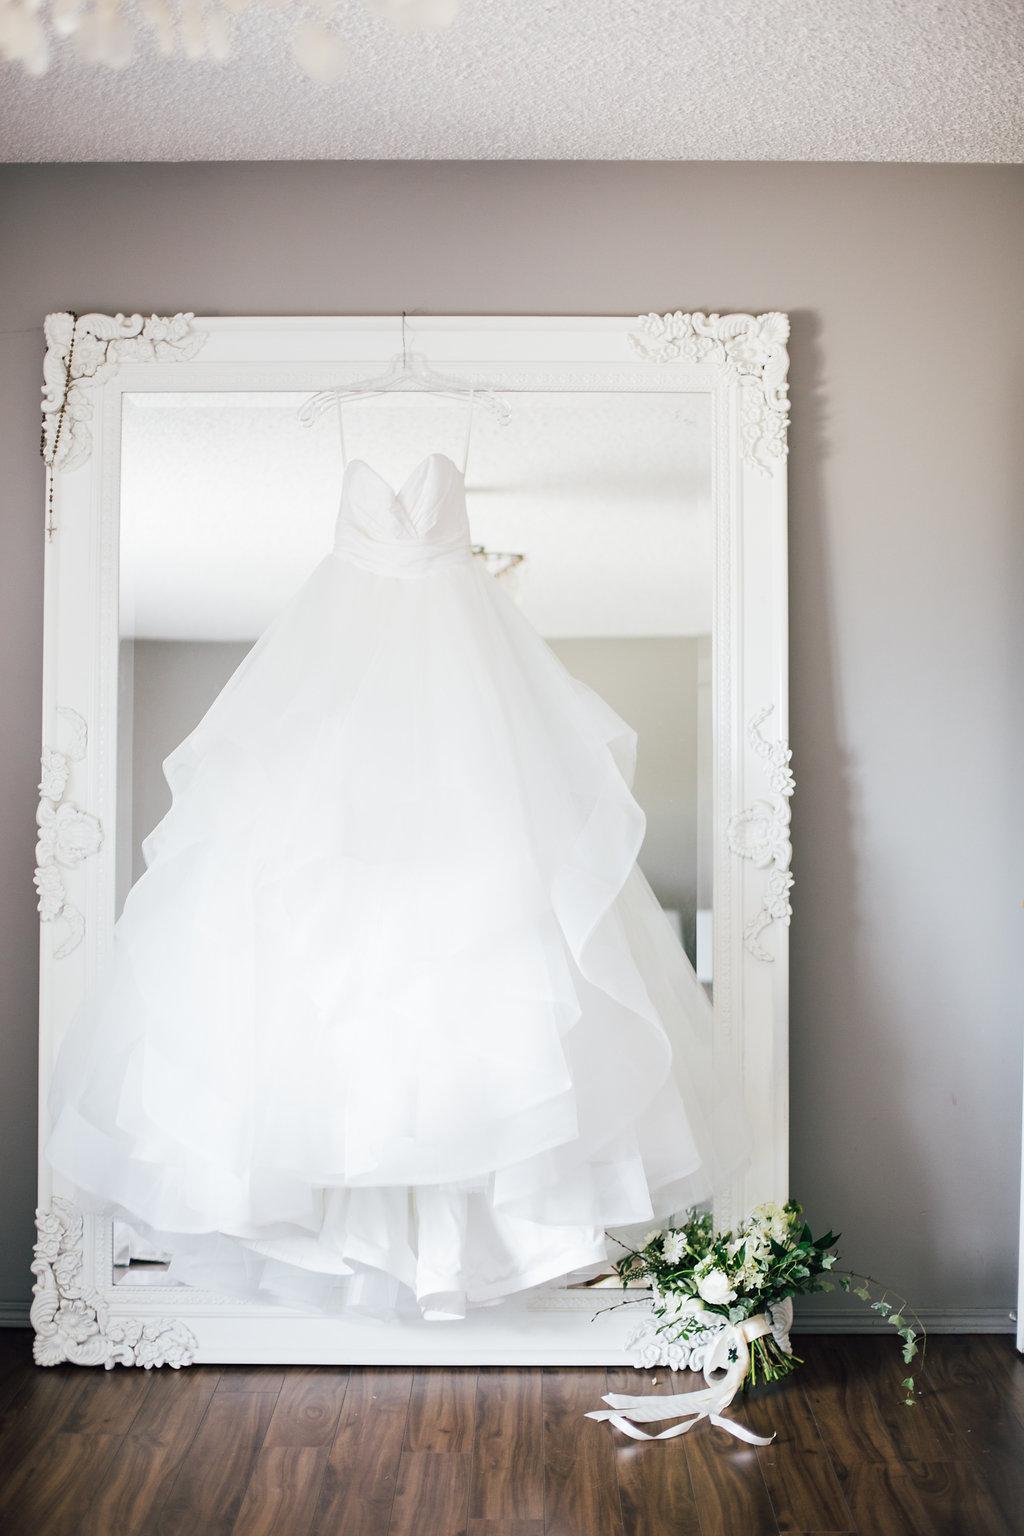 White and Green Wedding Ideas - Wedding Florists Winnipeg